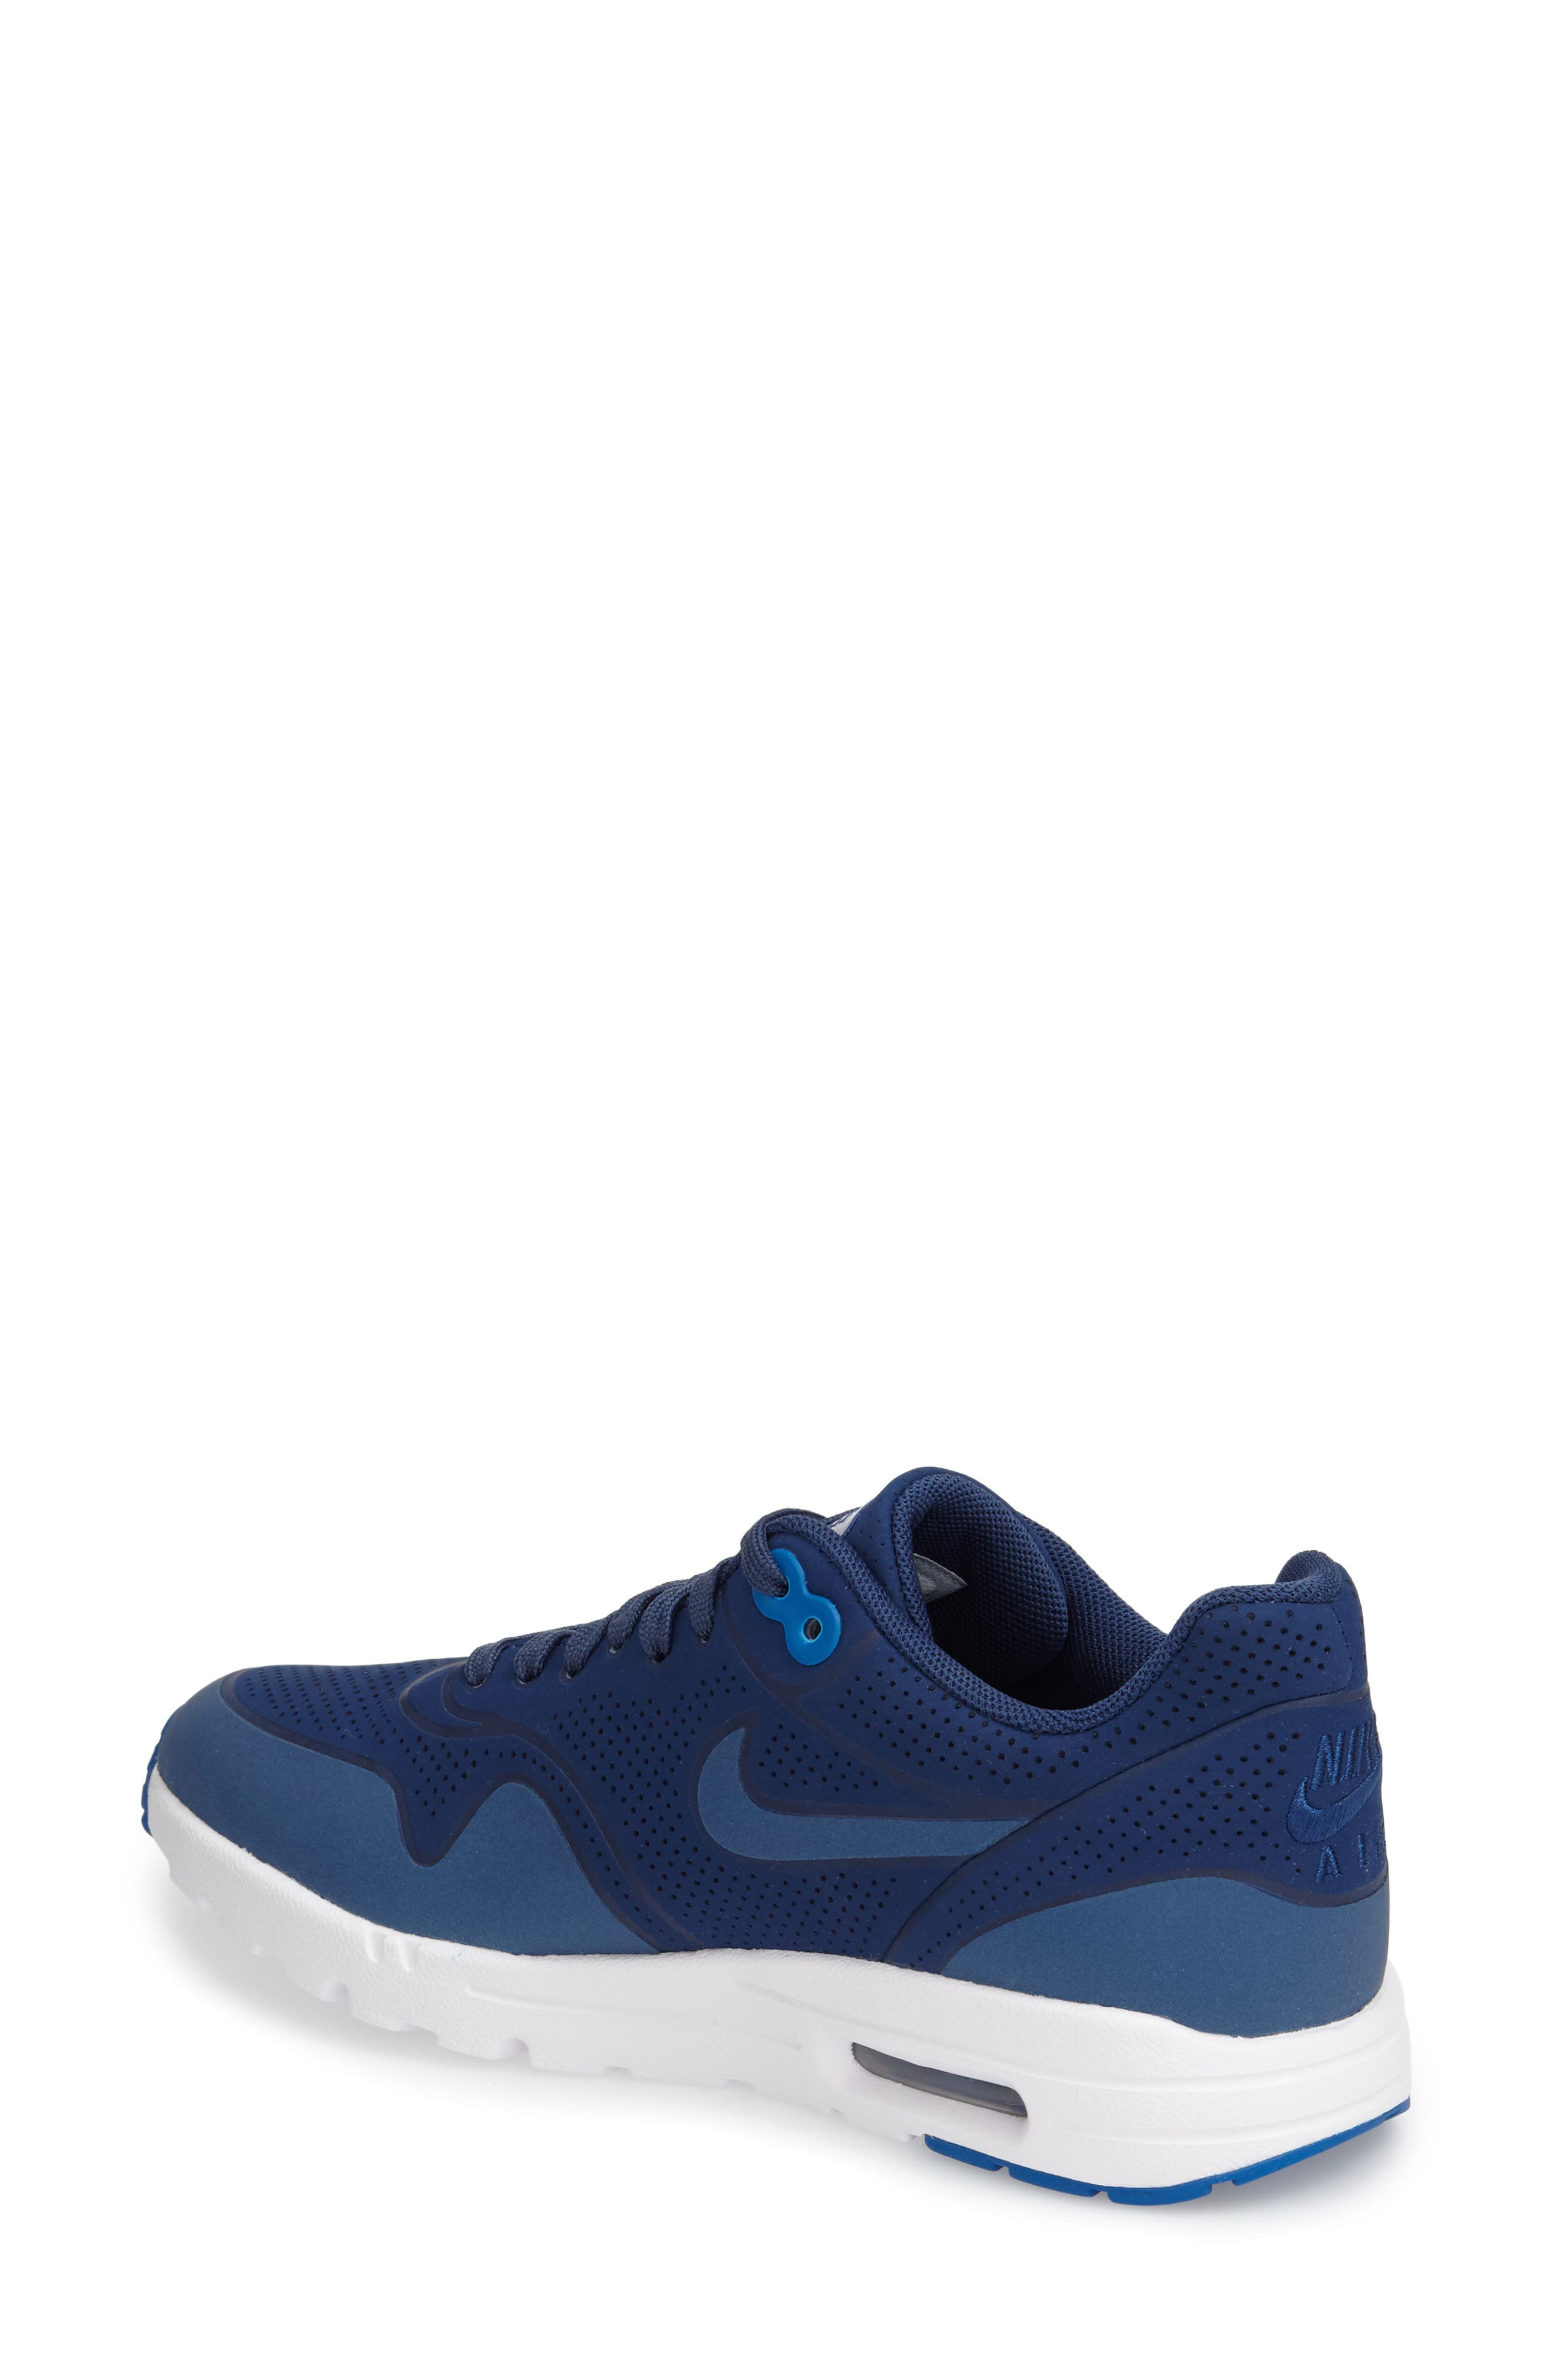 ,                             'Air Max 1 - Ultra Moire' Sneaker,                             Alternate thumbnail 84, color,                             403